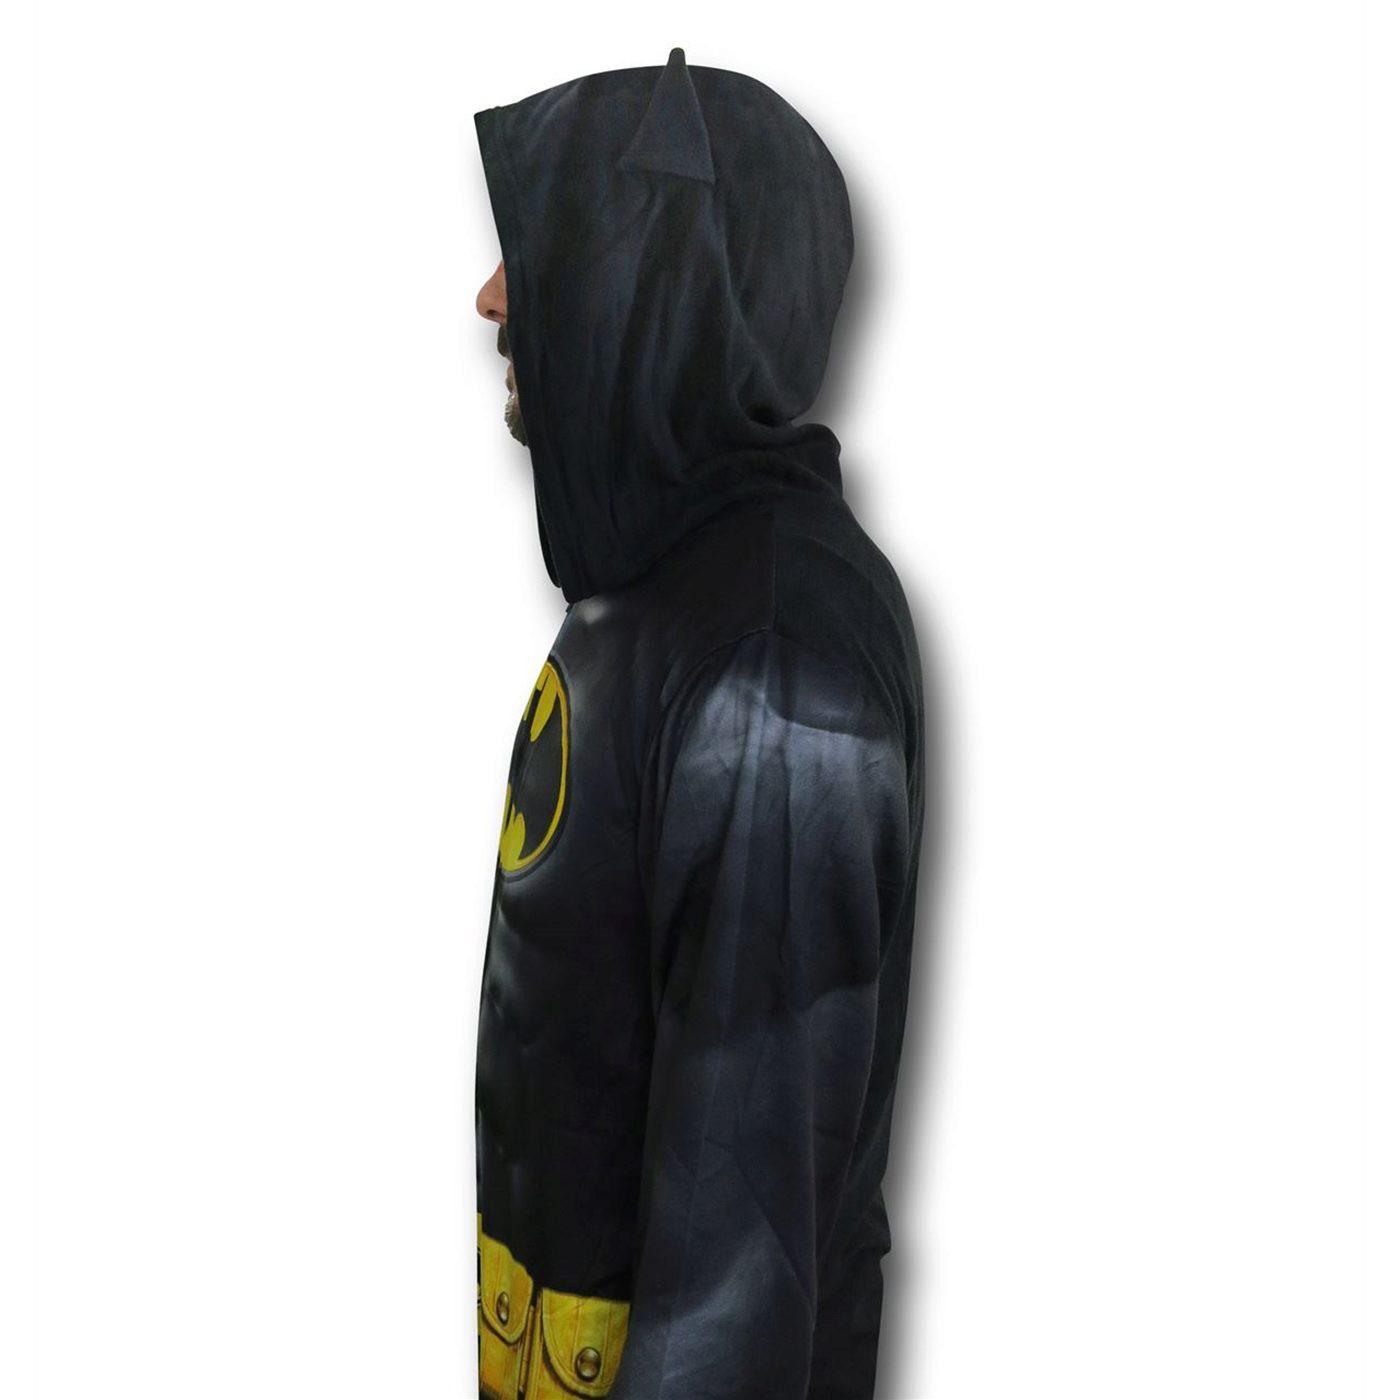 Batman Dark Knight Sublimated Union Suit